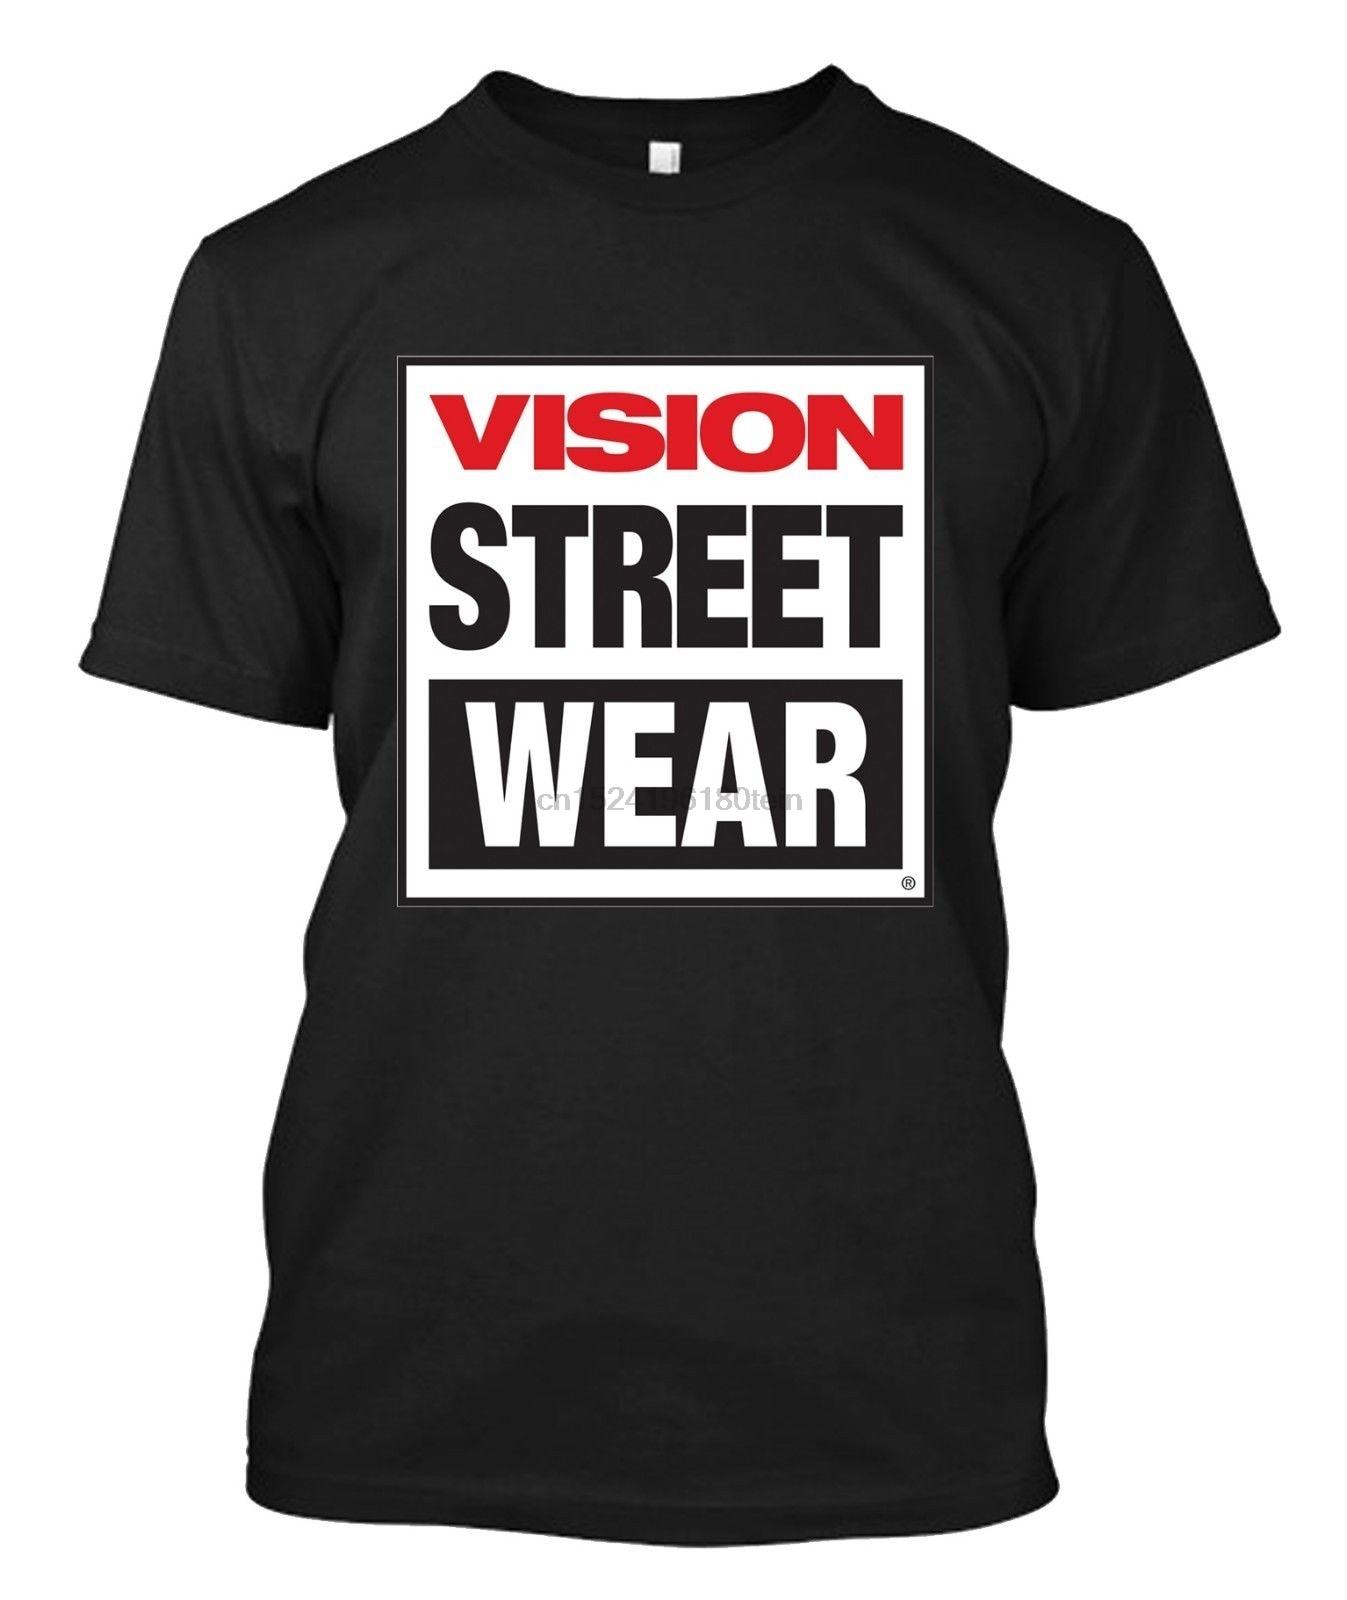 ASAP SHIRT Vision Street Wear Mens Classic Big Logo New Black T-Shirt S-3XL